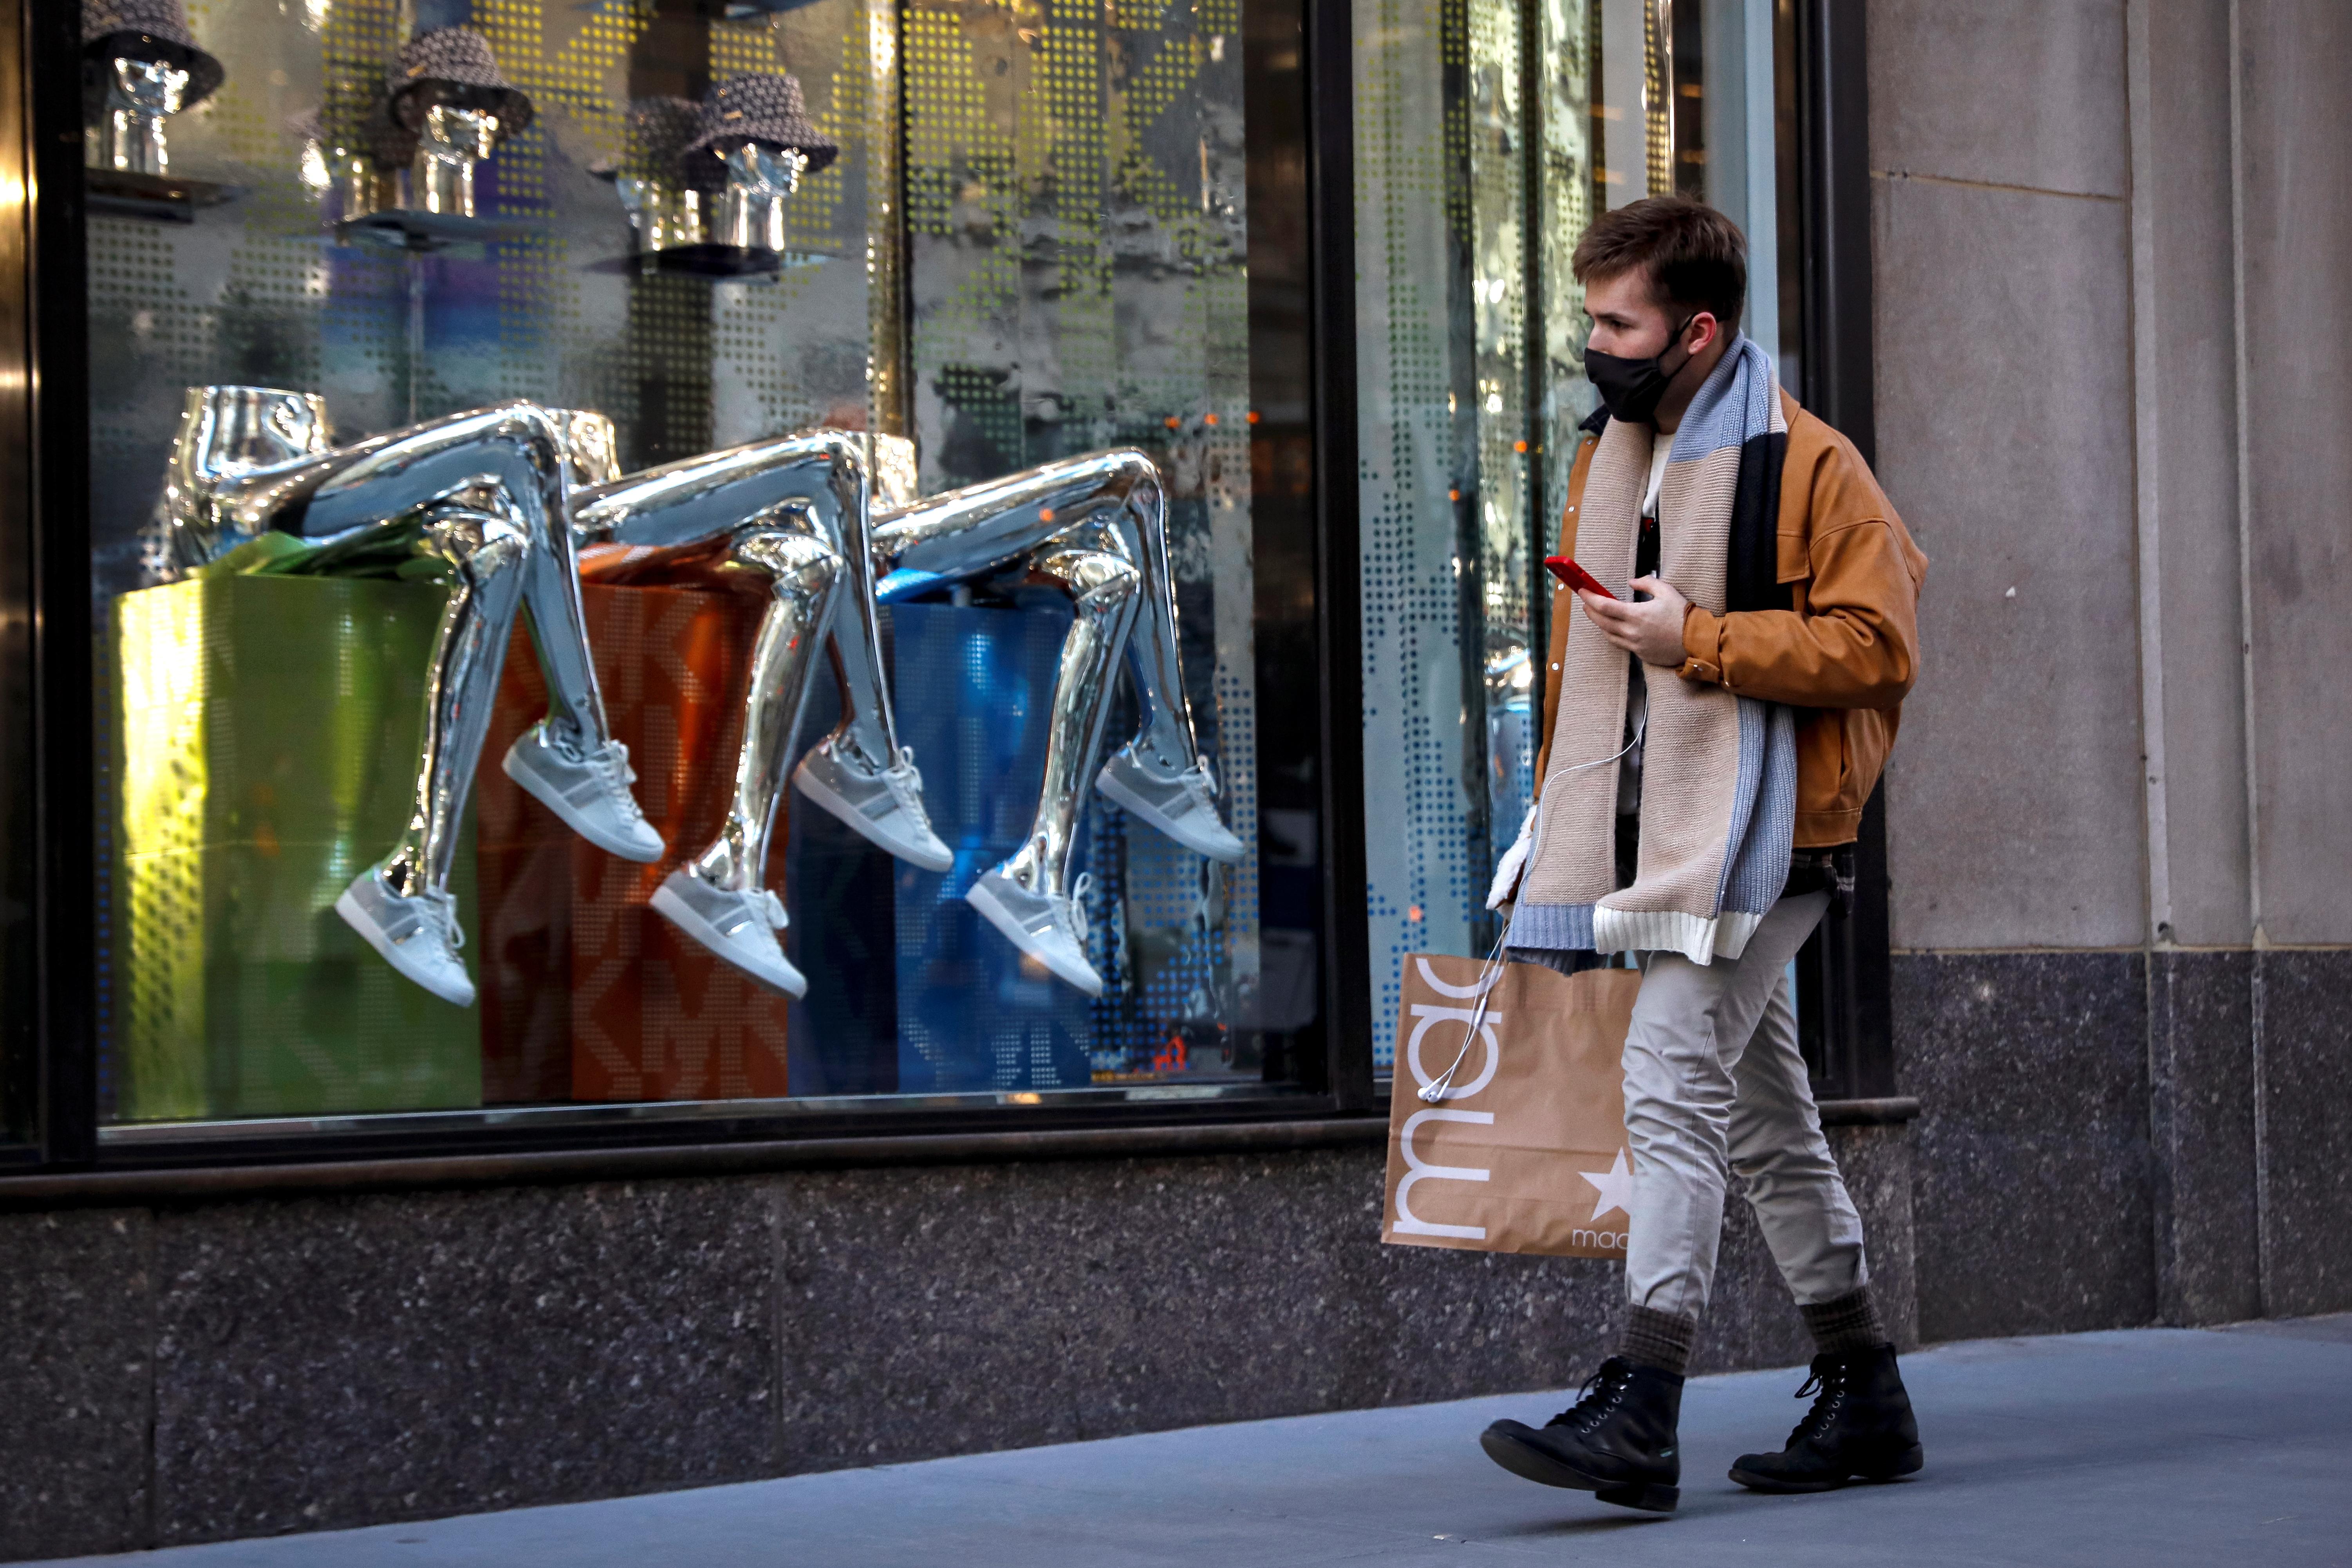 A man shops, during the coronavirus disease (COVID-19) pandemic, on 5th Avenue in New York, U.S., February 17, 2021.  REUTERS/Brendan McDermid